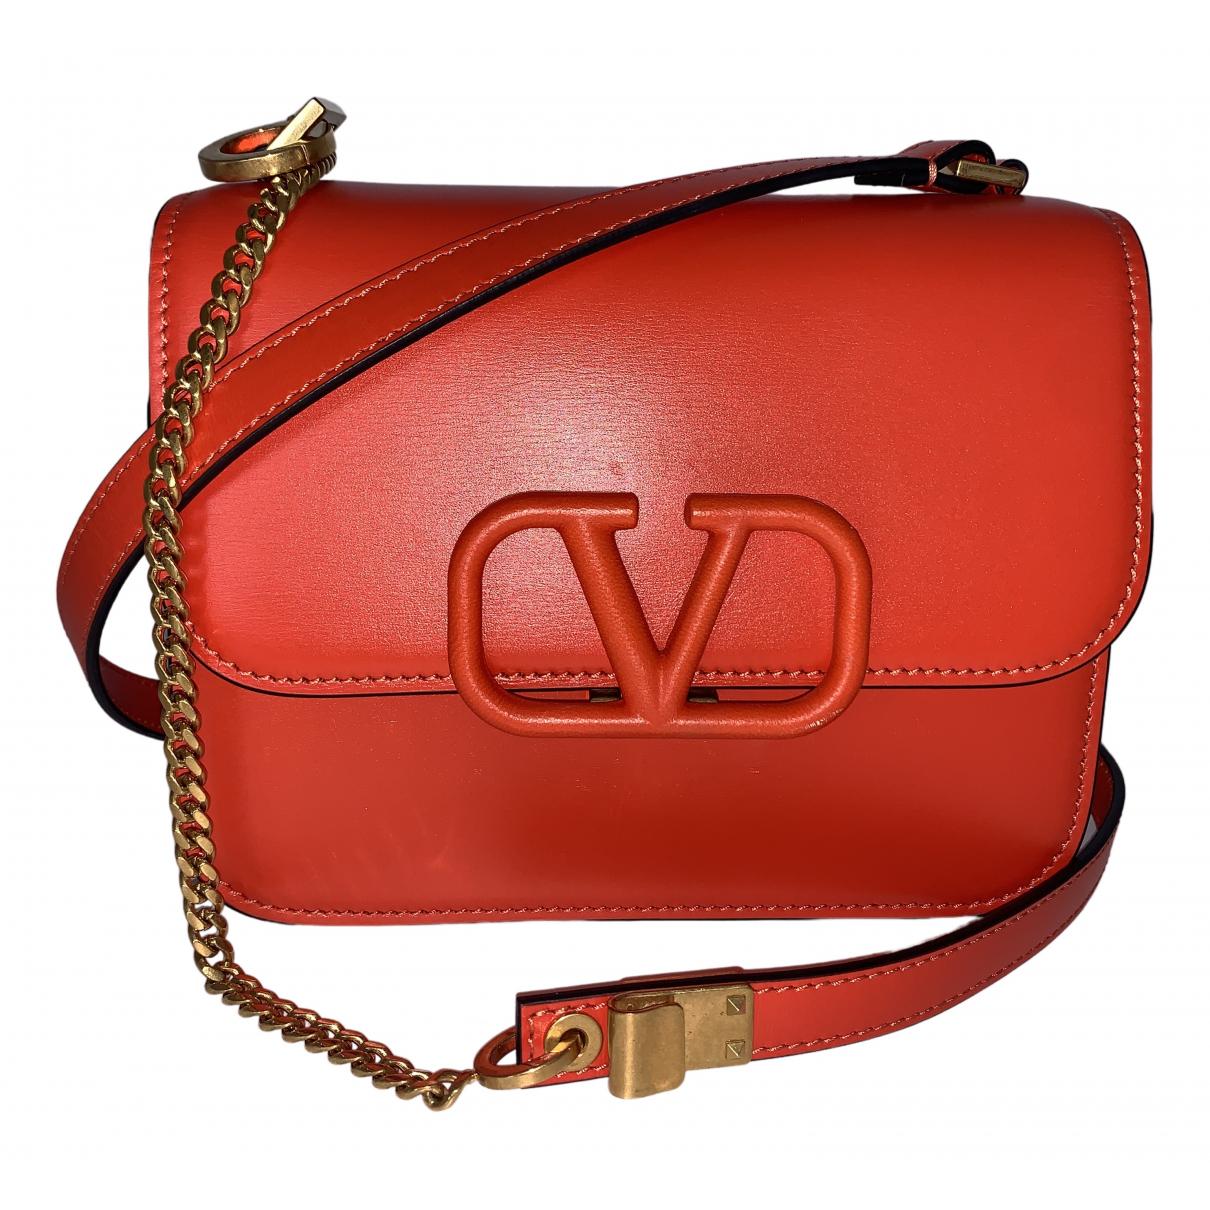 Valentino Garavani Vsling Handtasche in  Rot Leder